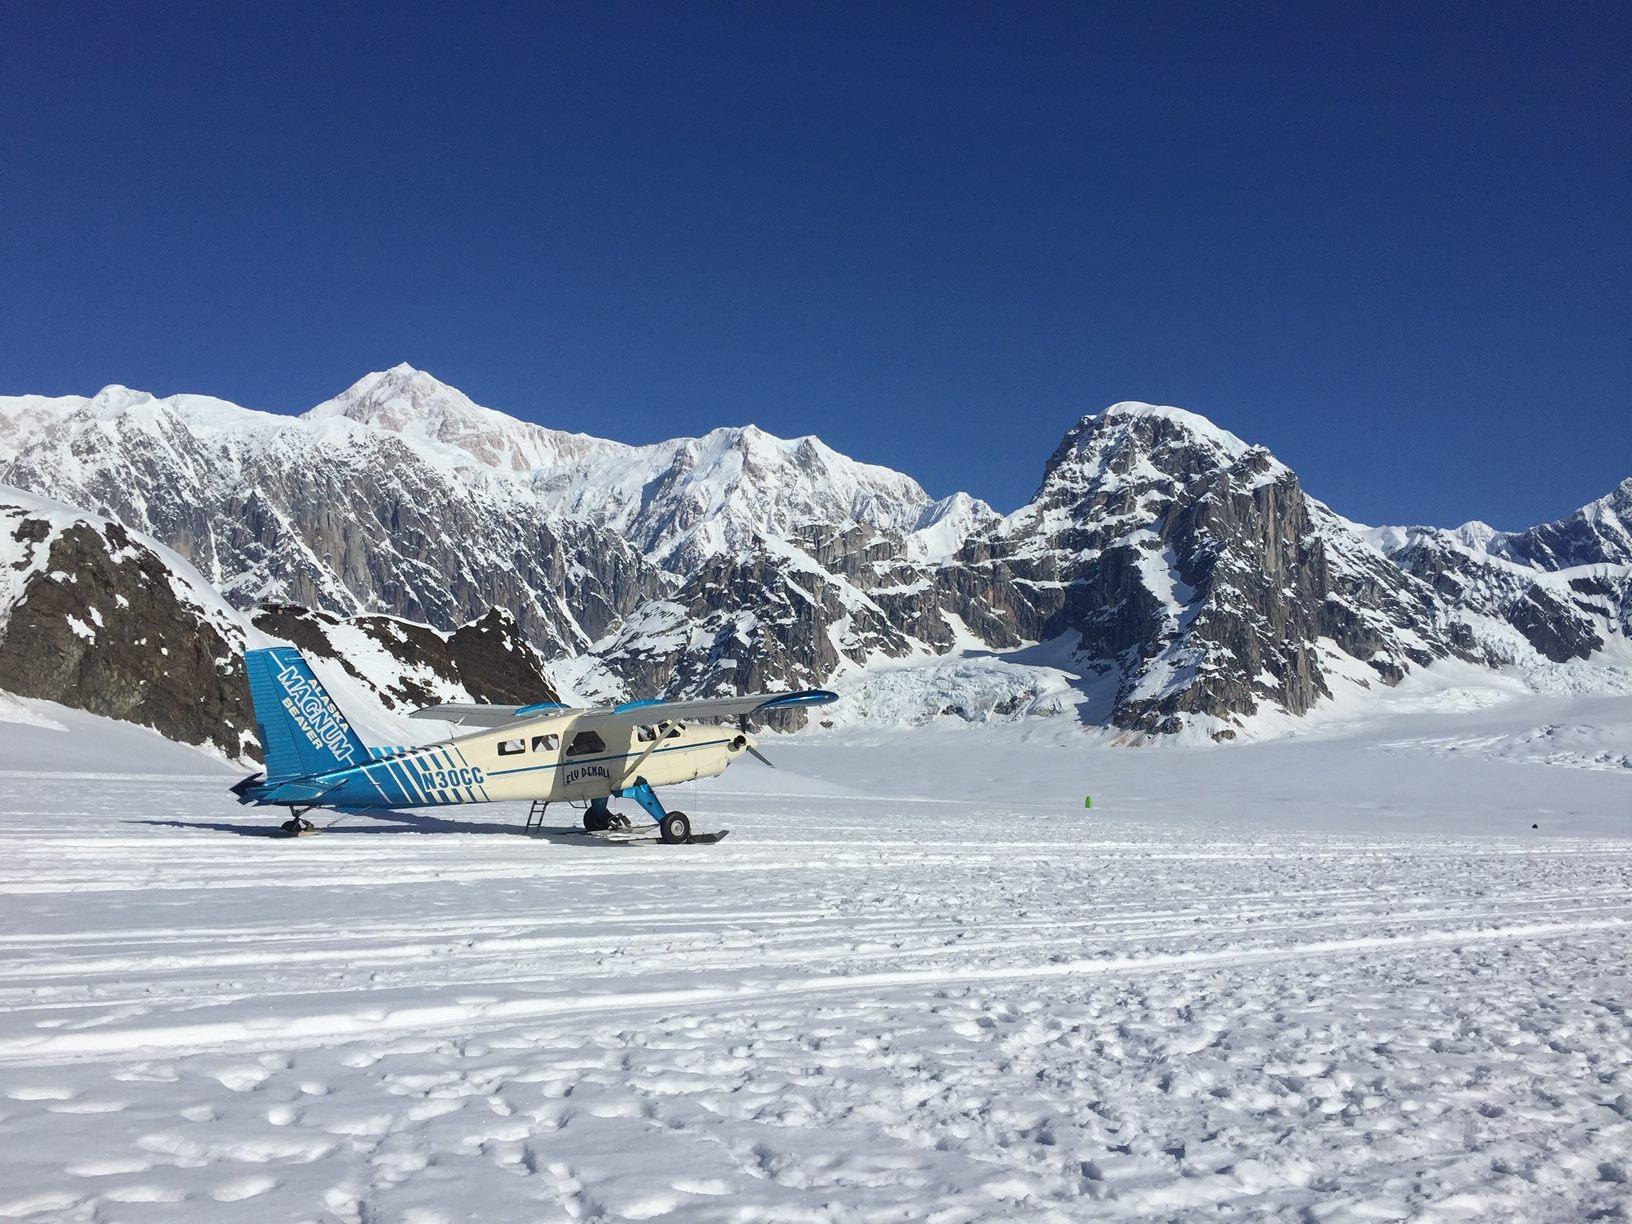 Charlie Charlie on the Ruth Glacier